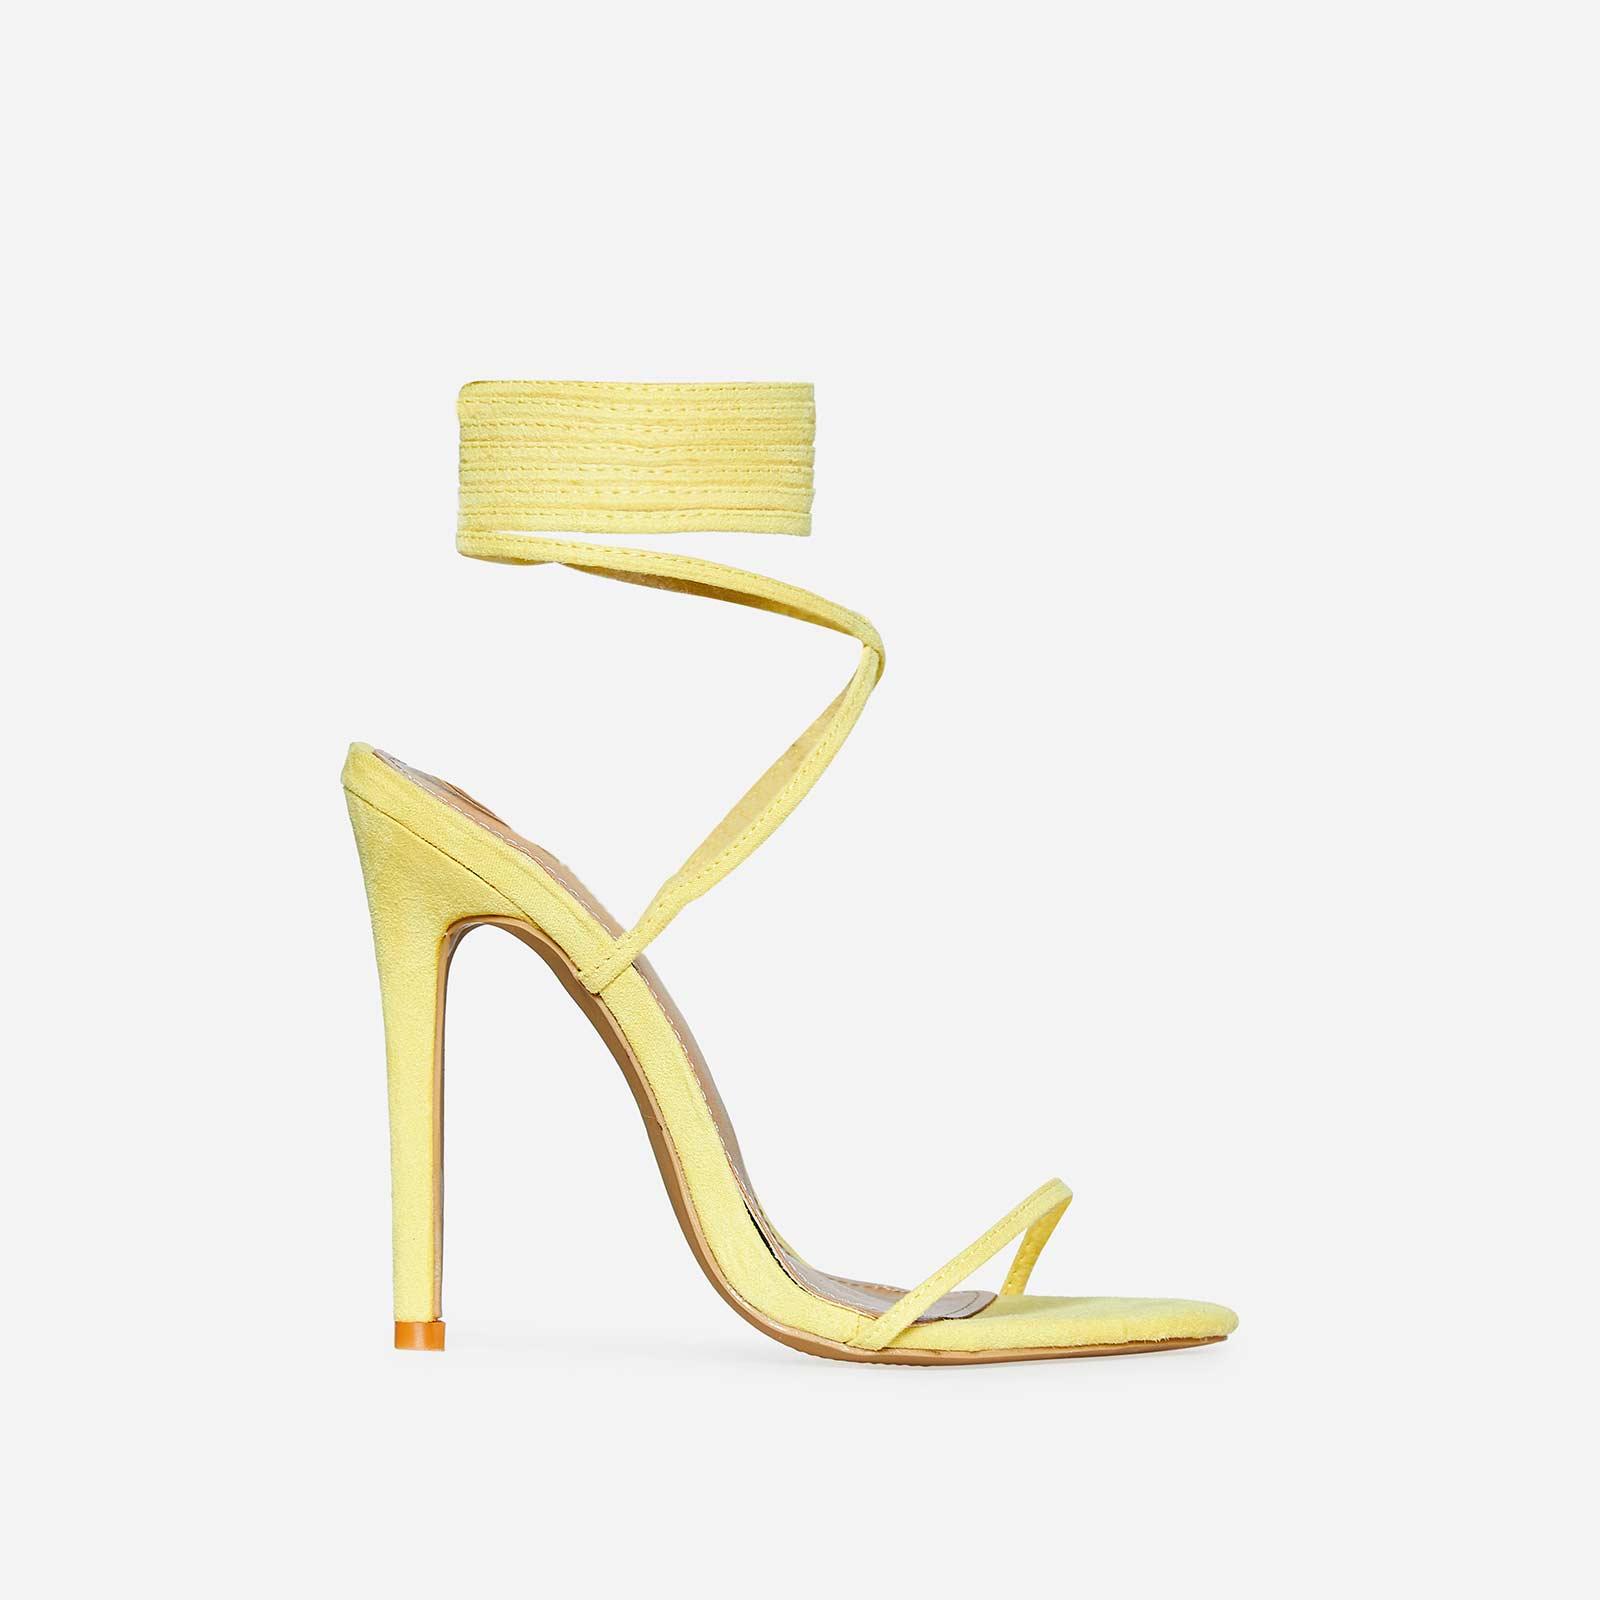 Ali Lace Up Heel In Lemon Yellow Faux Suede